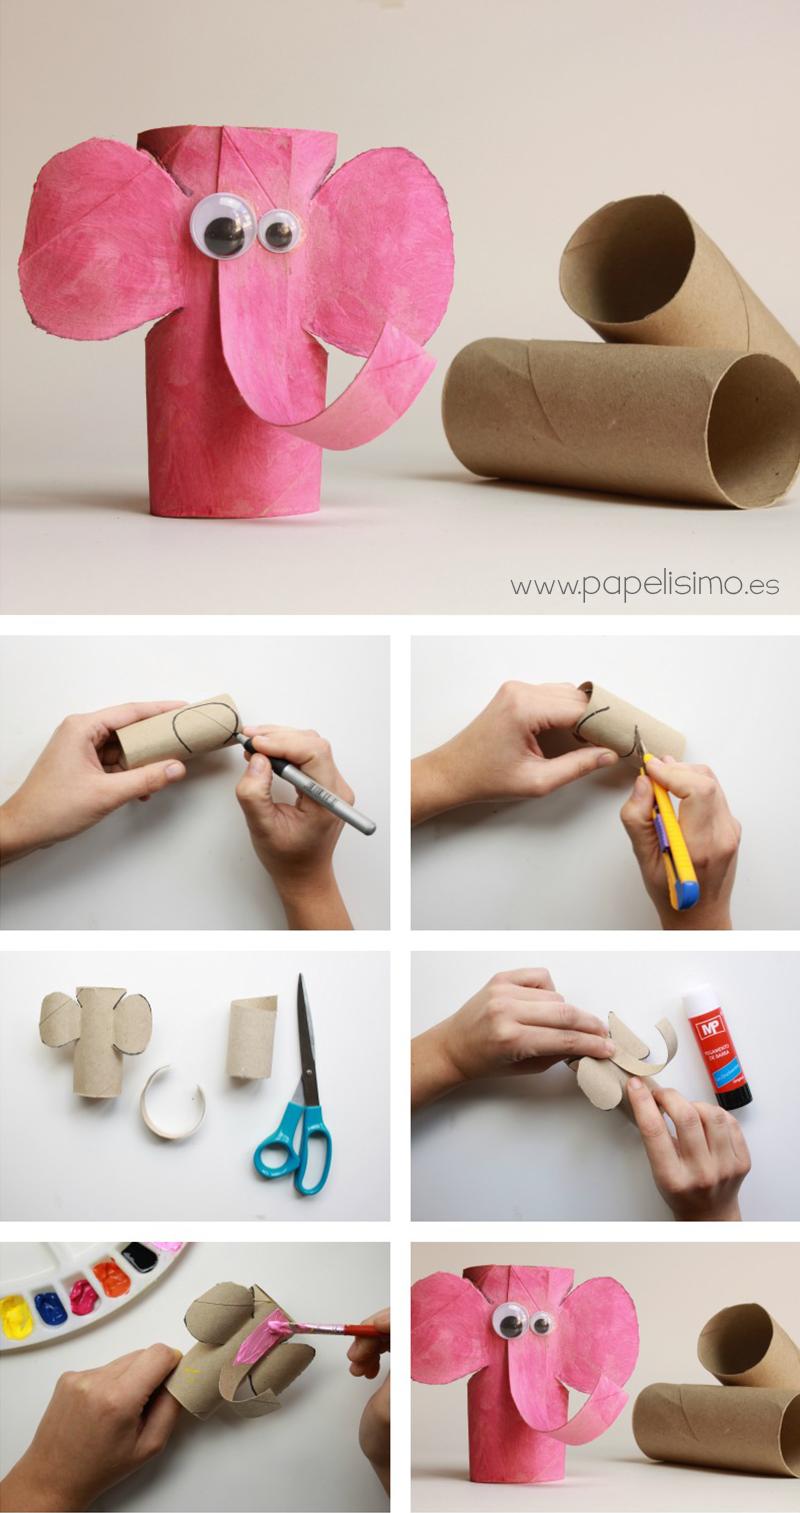 Elefante con rollos de papel higi nico me gusta reciclar - Decoracion con rollos de papel higienico ...